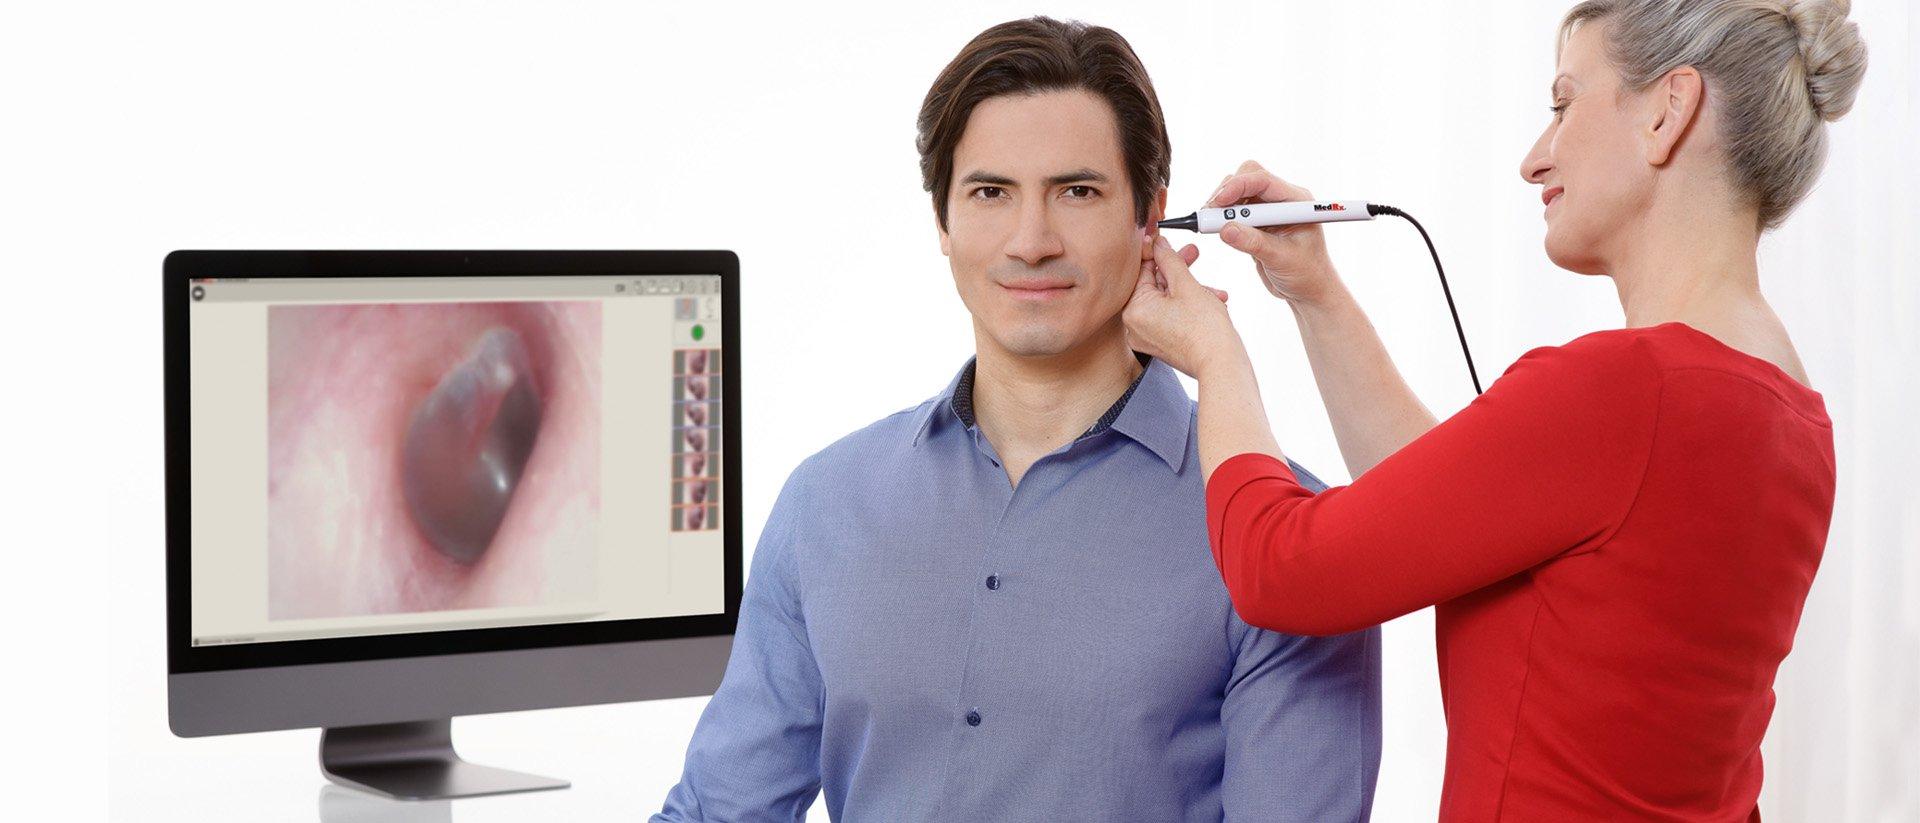 medrx-video-otoscope-top